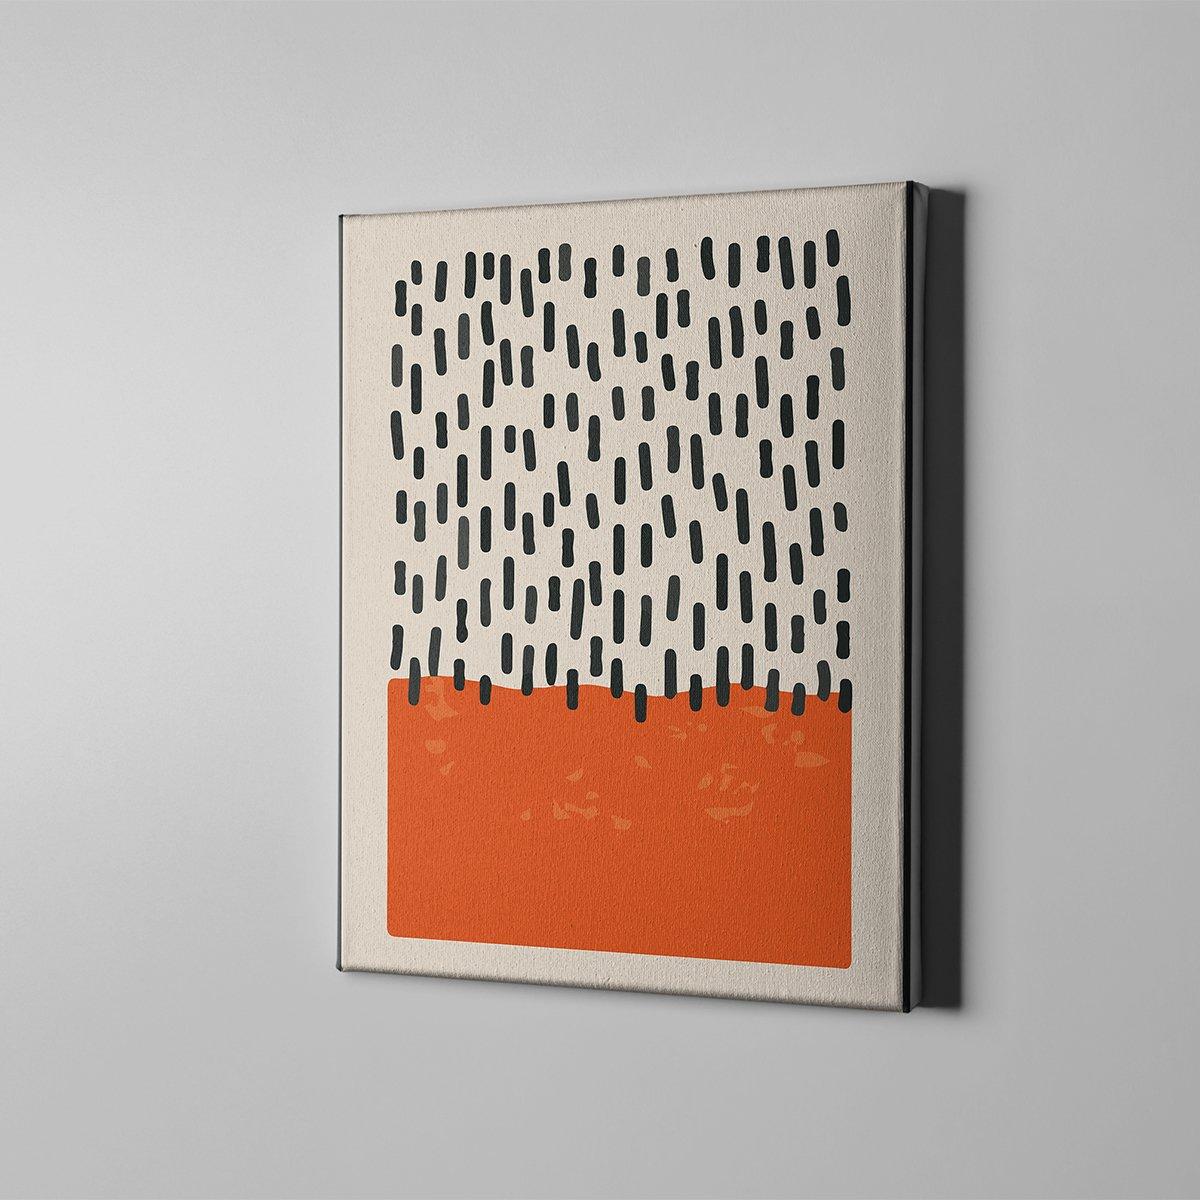 Turuncu Desen Kanvas Tablo